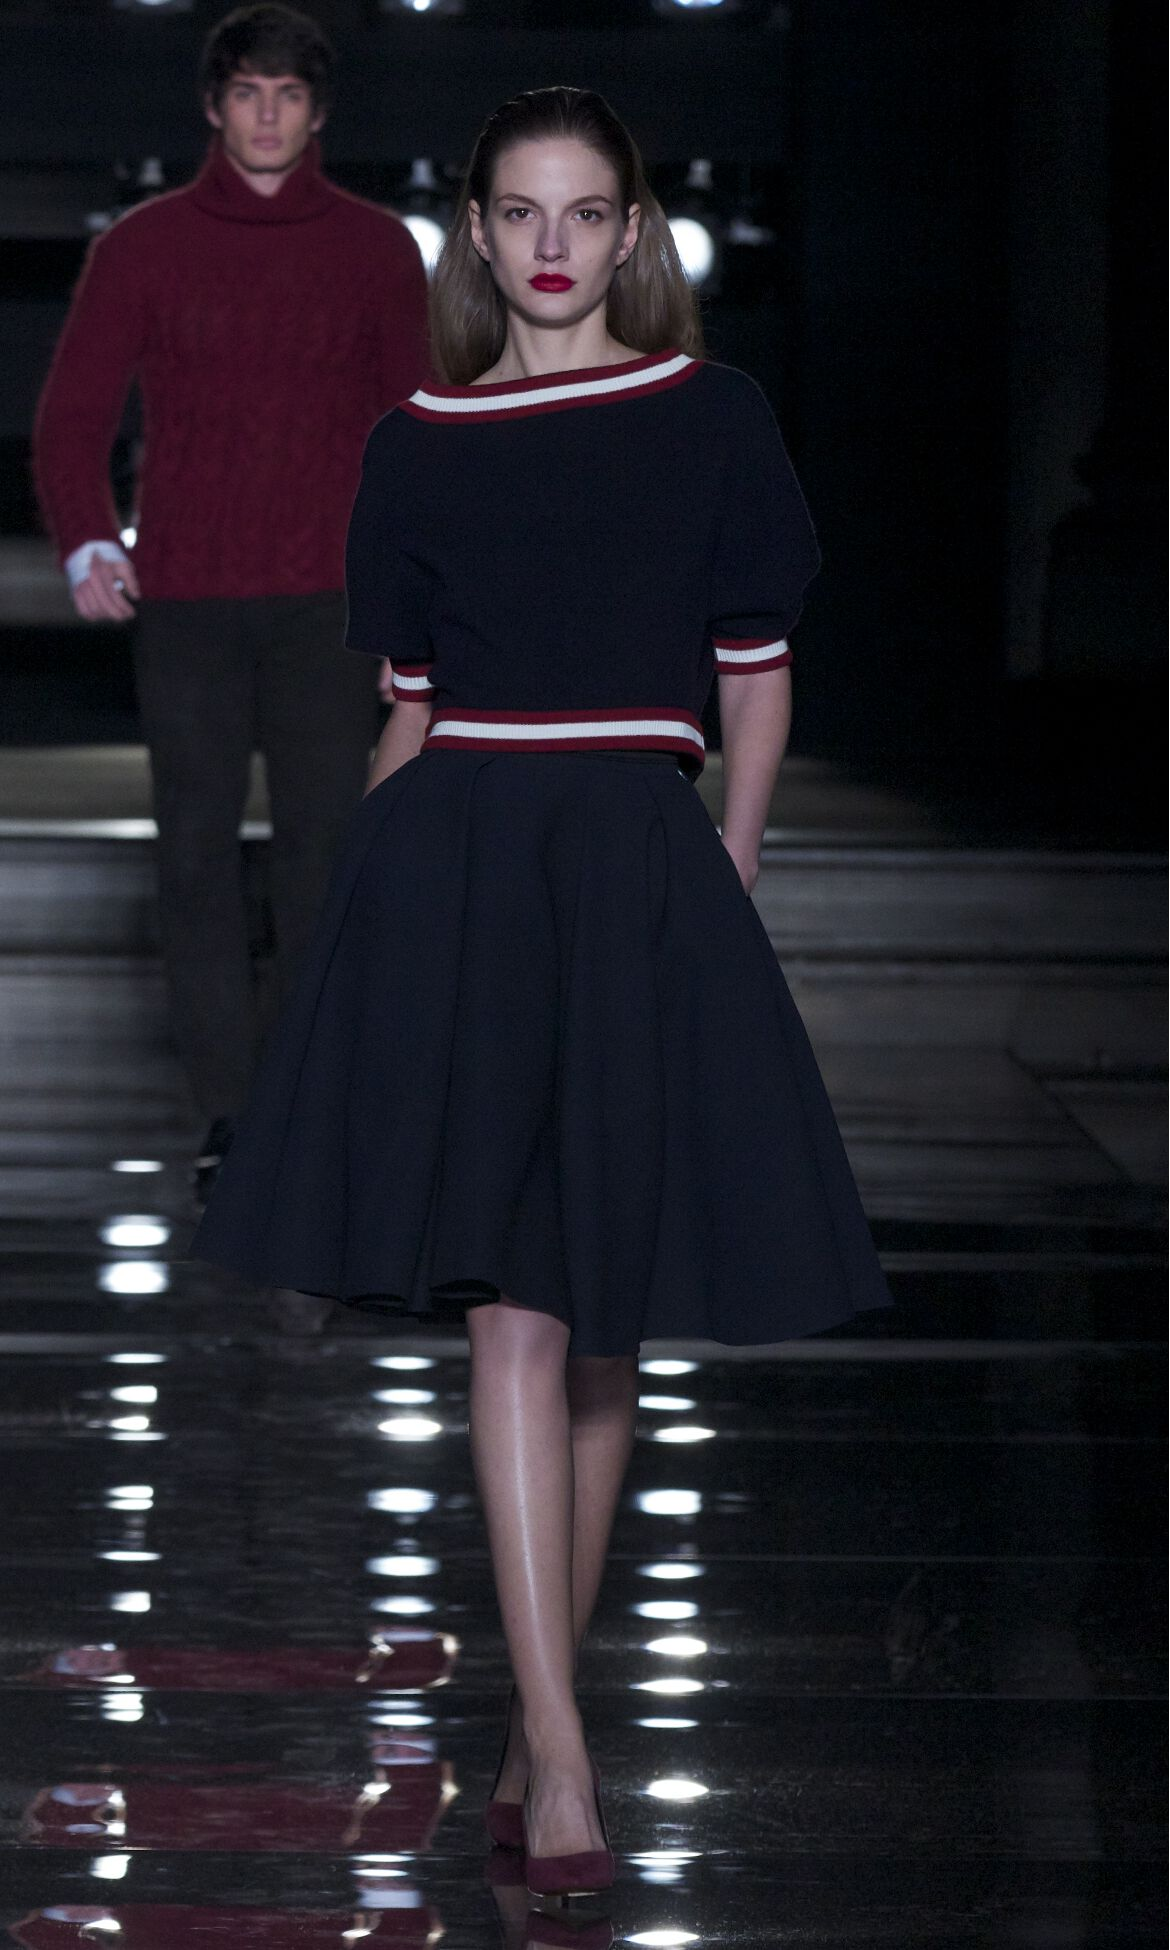 Fall Color Dress Fashion Woman